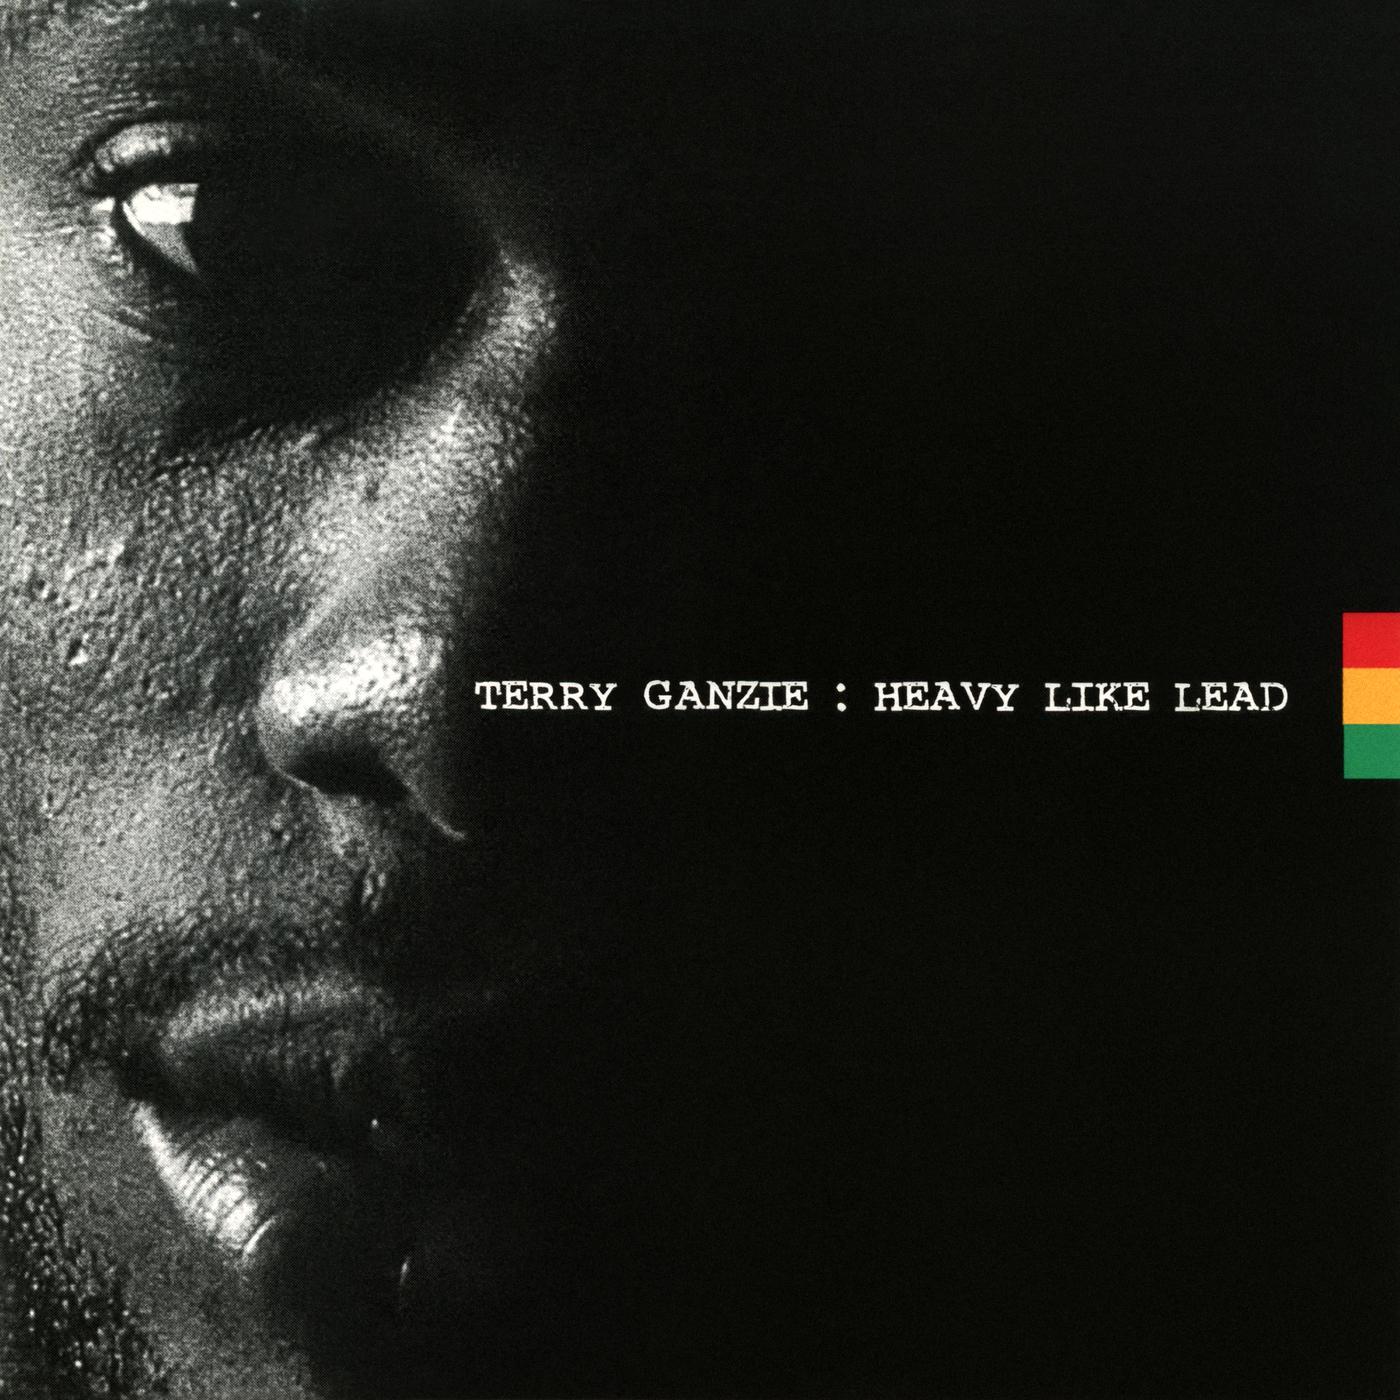 Heavy Like Lead - Terry Ganzie